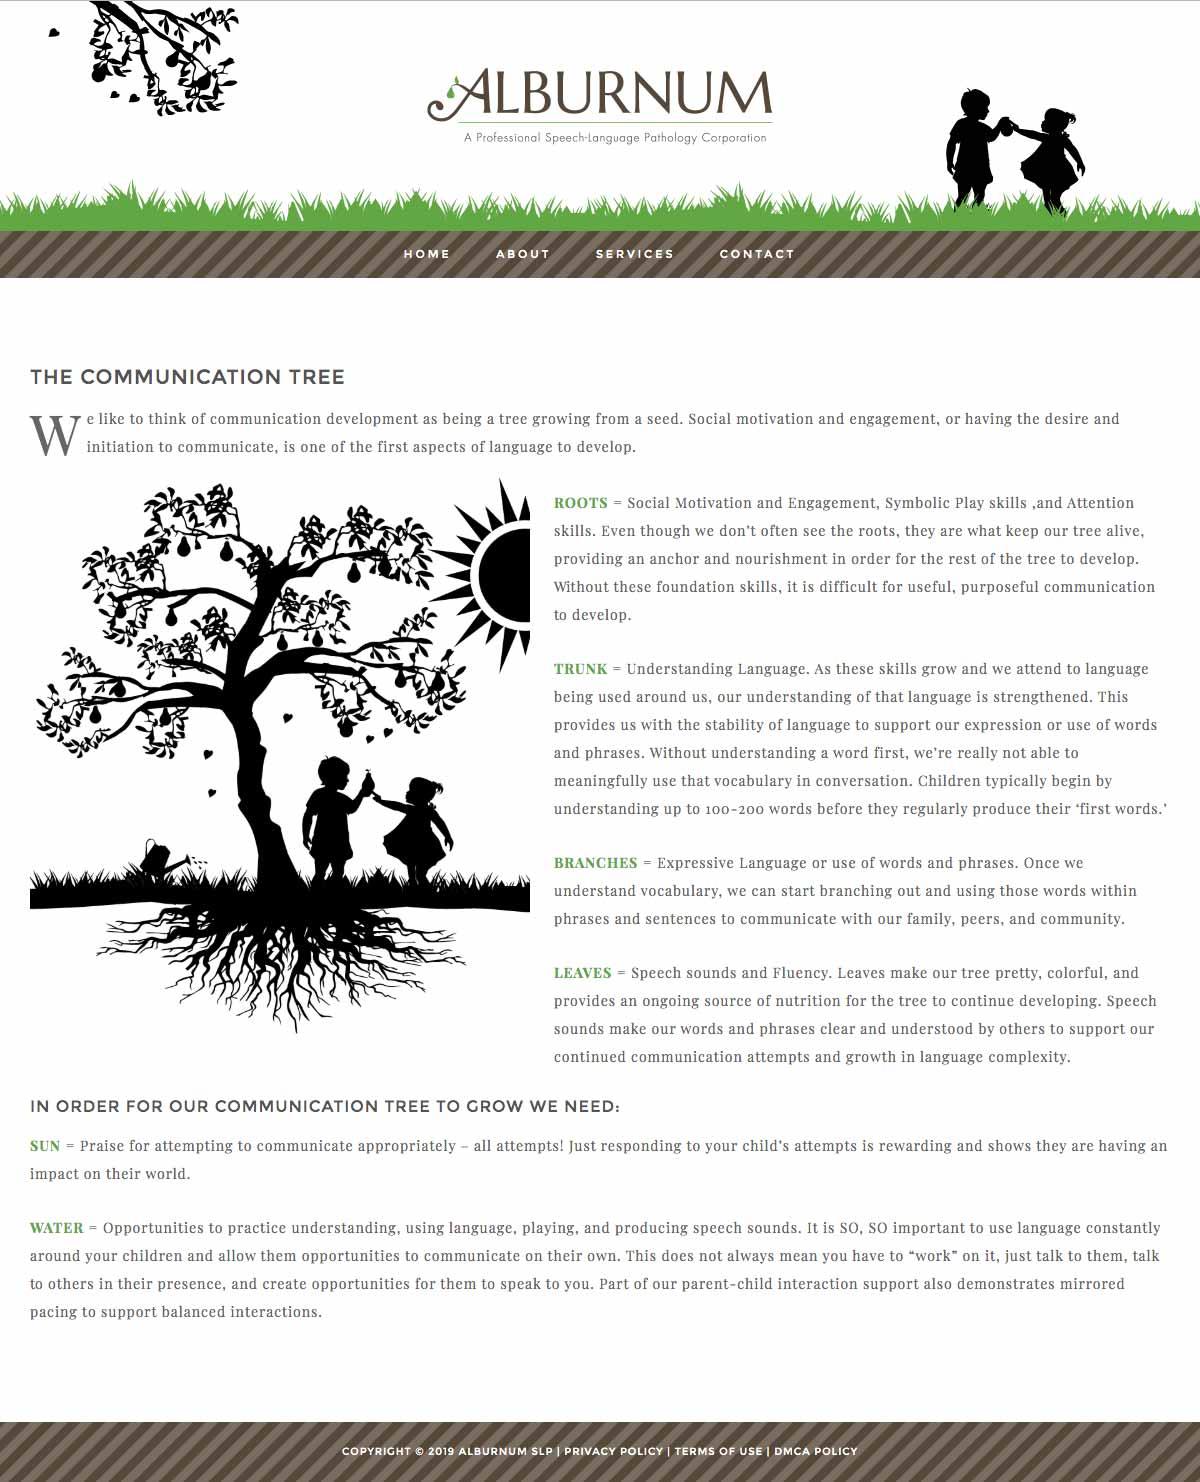 Alburnum Communication Tree page screen shot